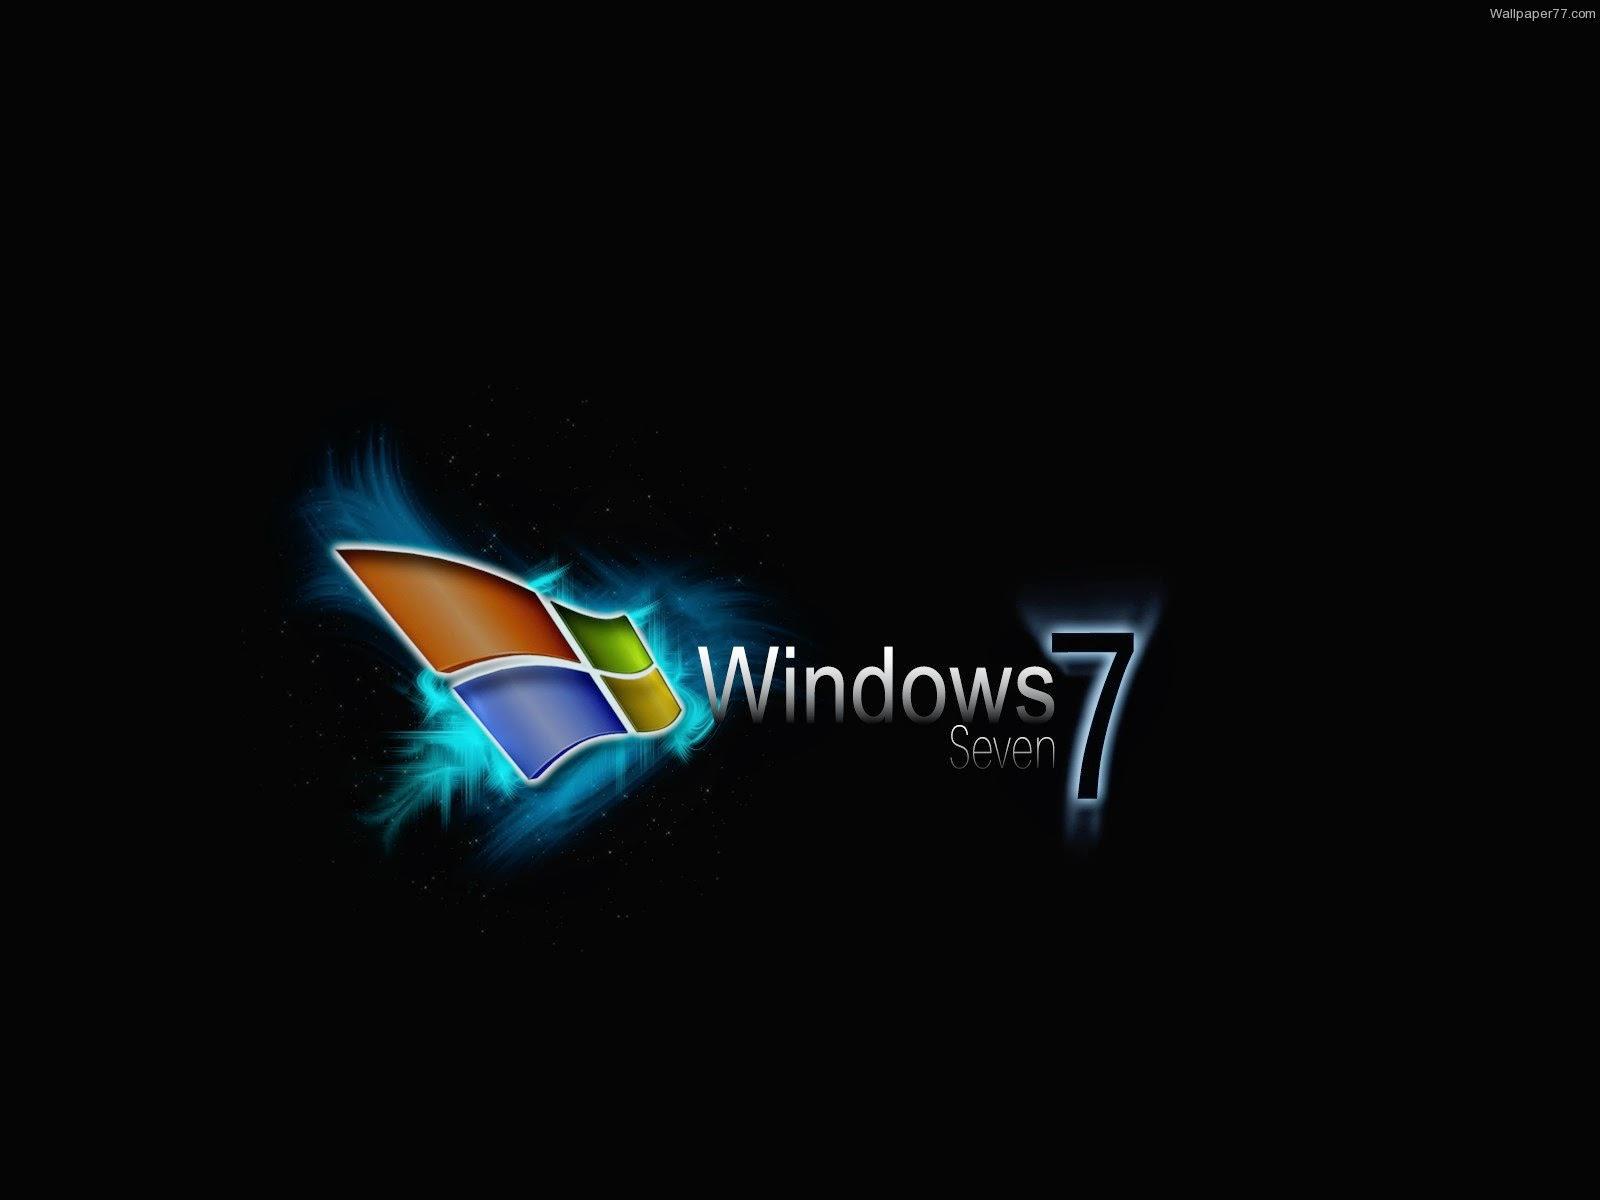 Windows 7 Animated Wallpaper Wallpaper Animated 1600x1200